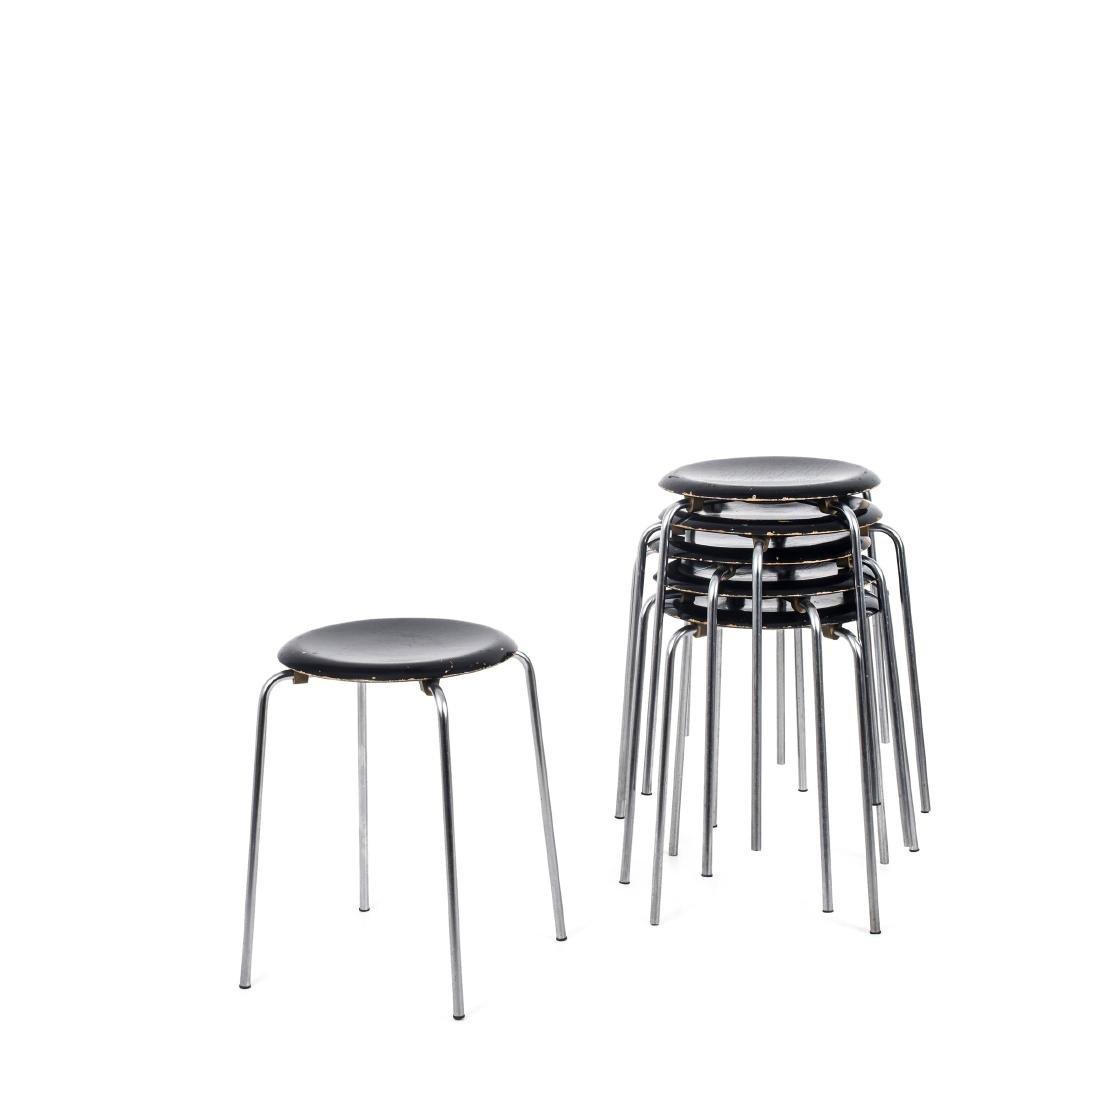 Six 'Dot' - '3170' stacking stools, c. 1955